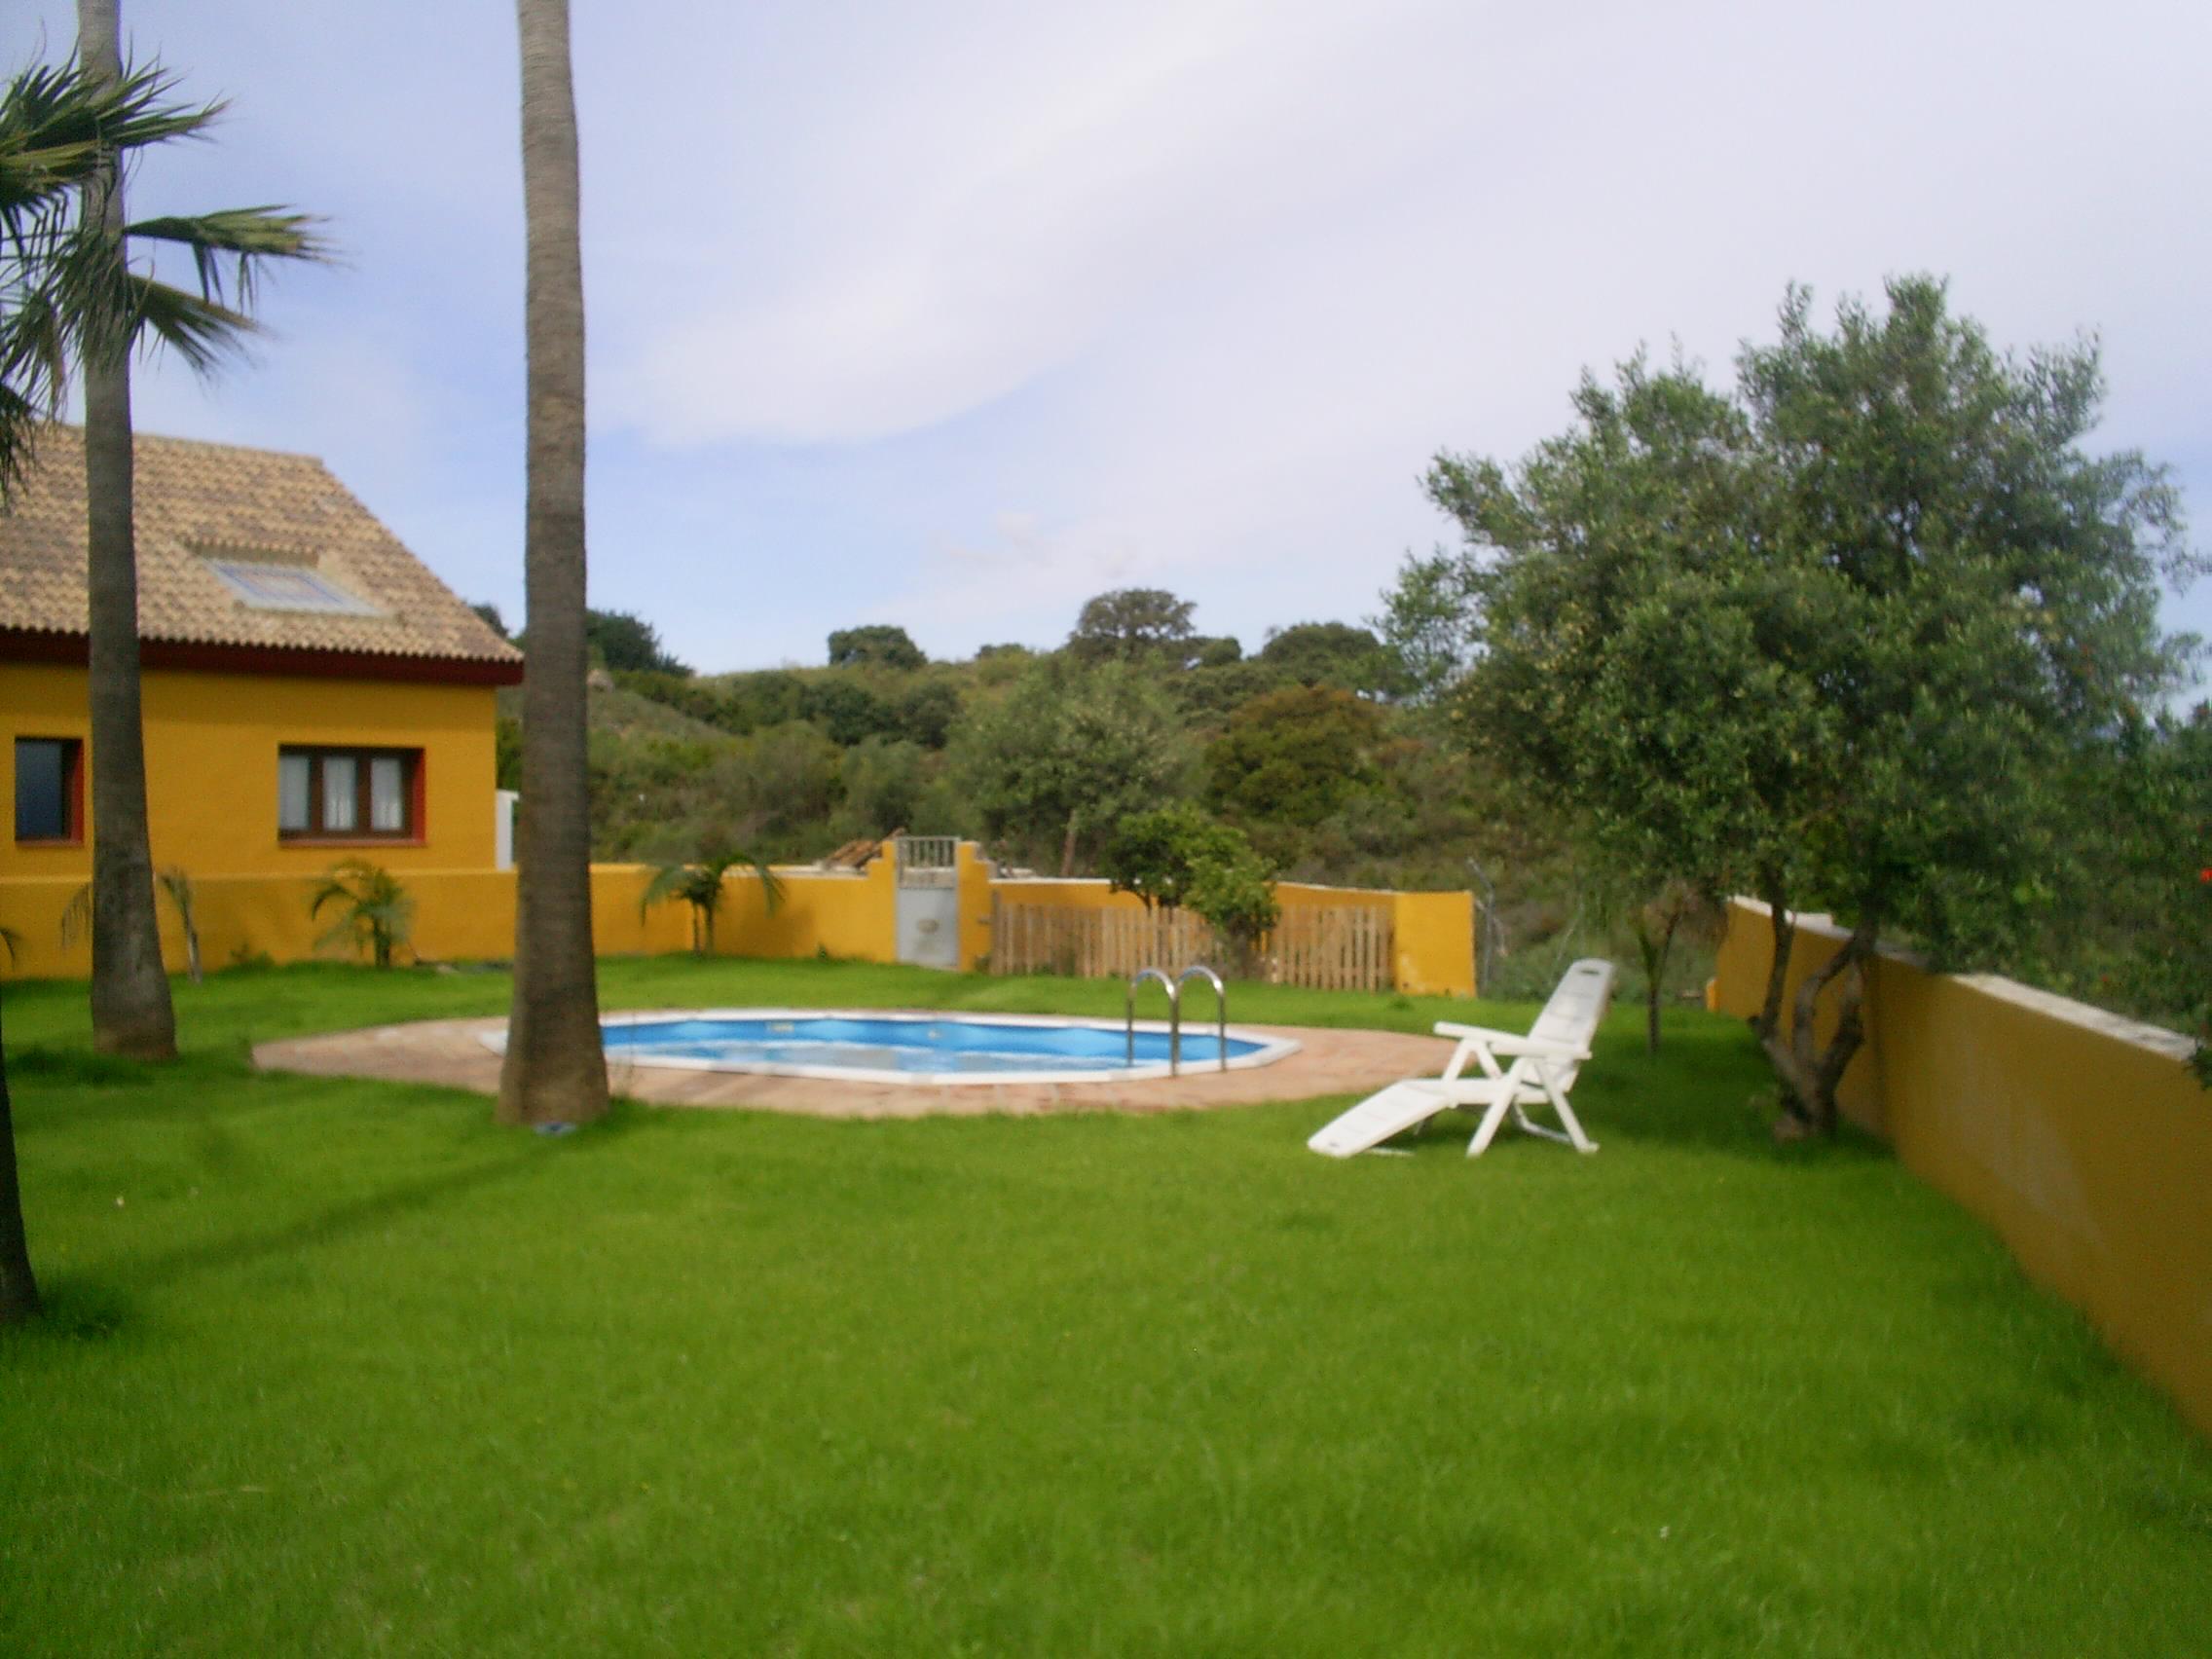 Location Andalousie Avec Piscine Villa 6